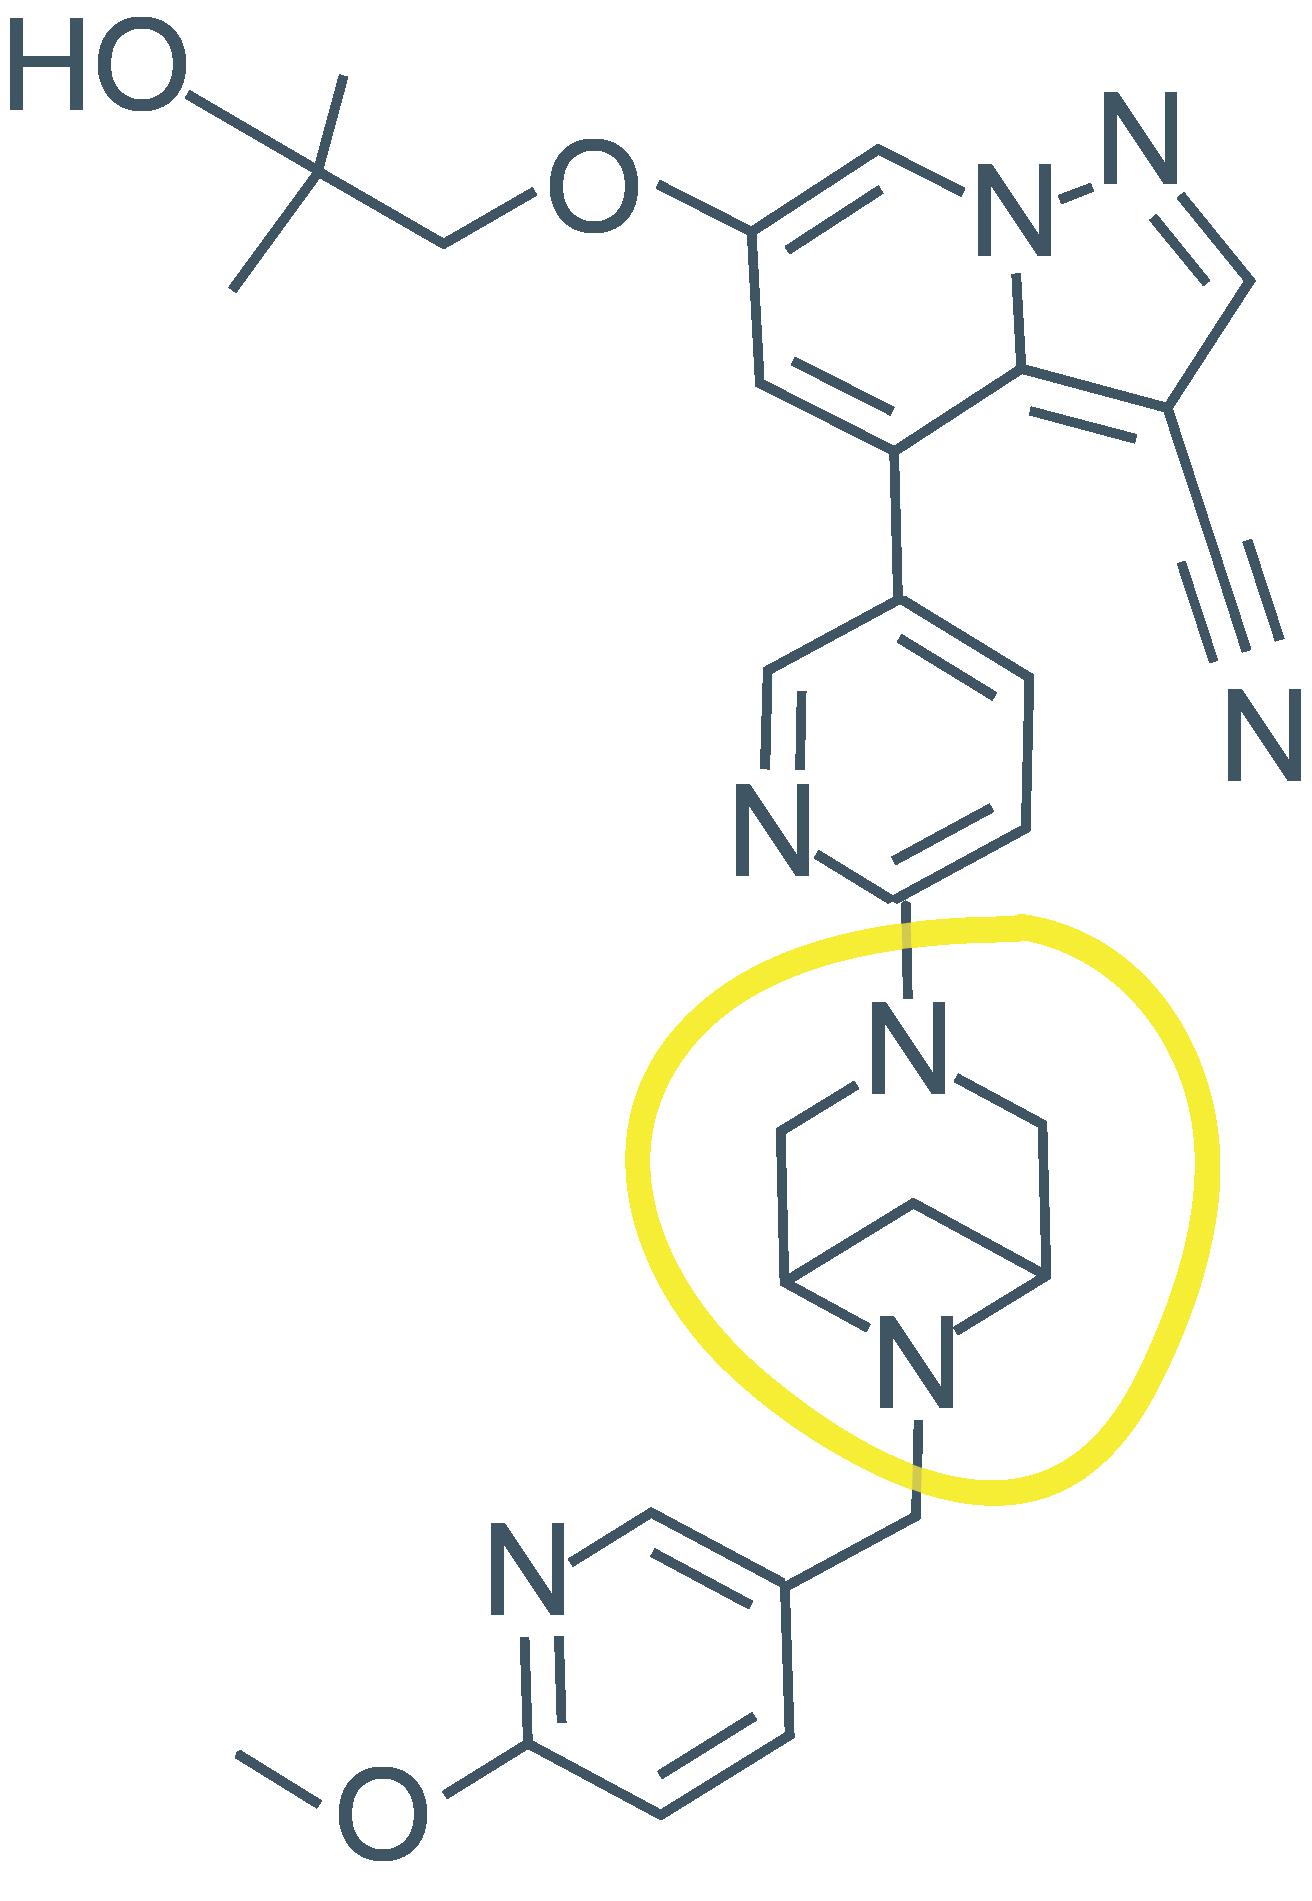 Figure 4. Structure of Selpercatinib